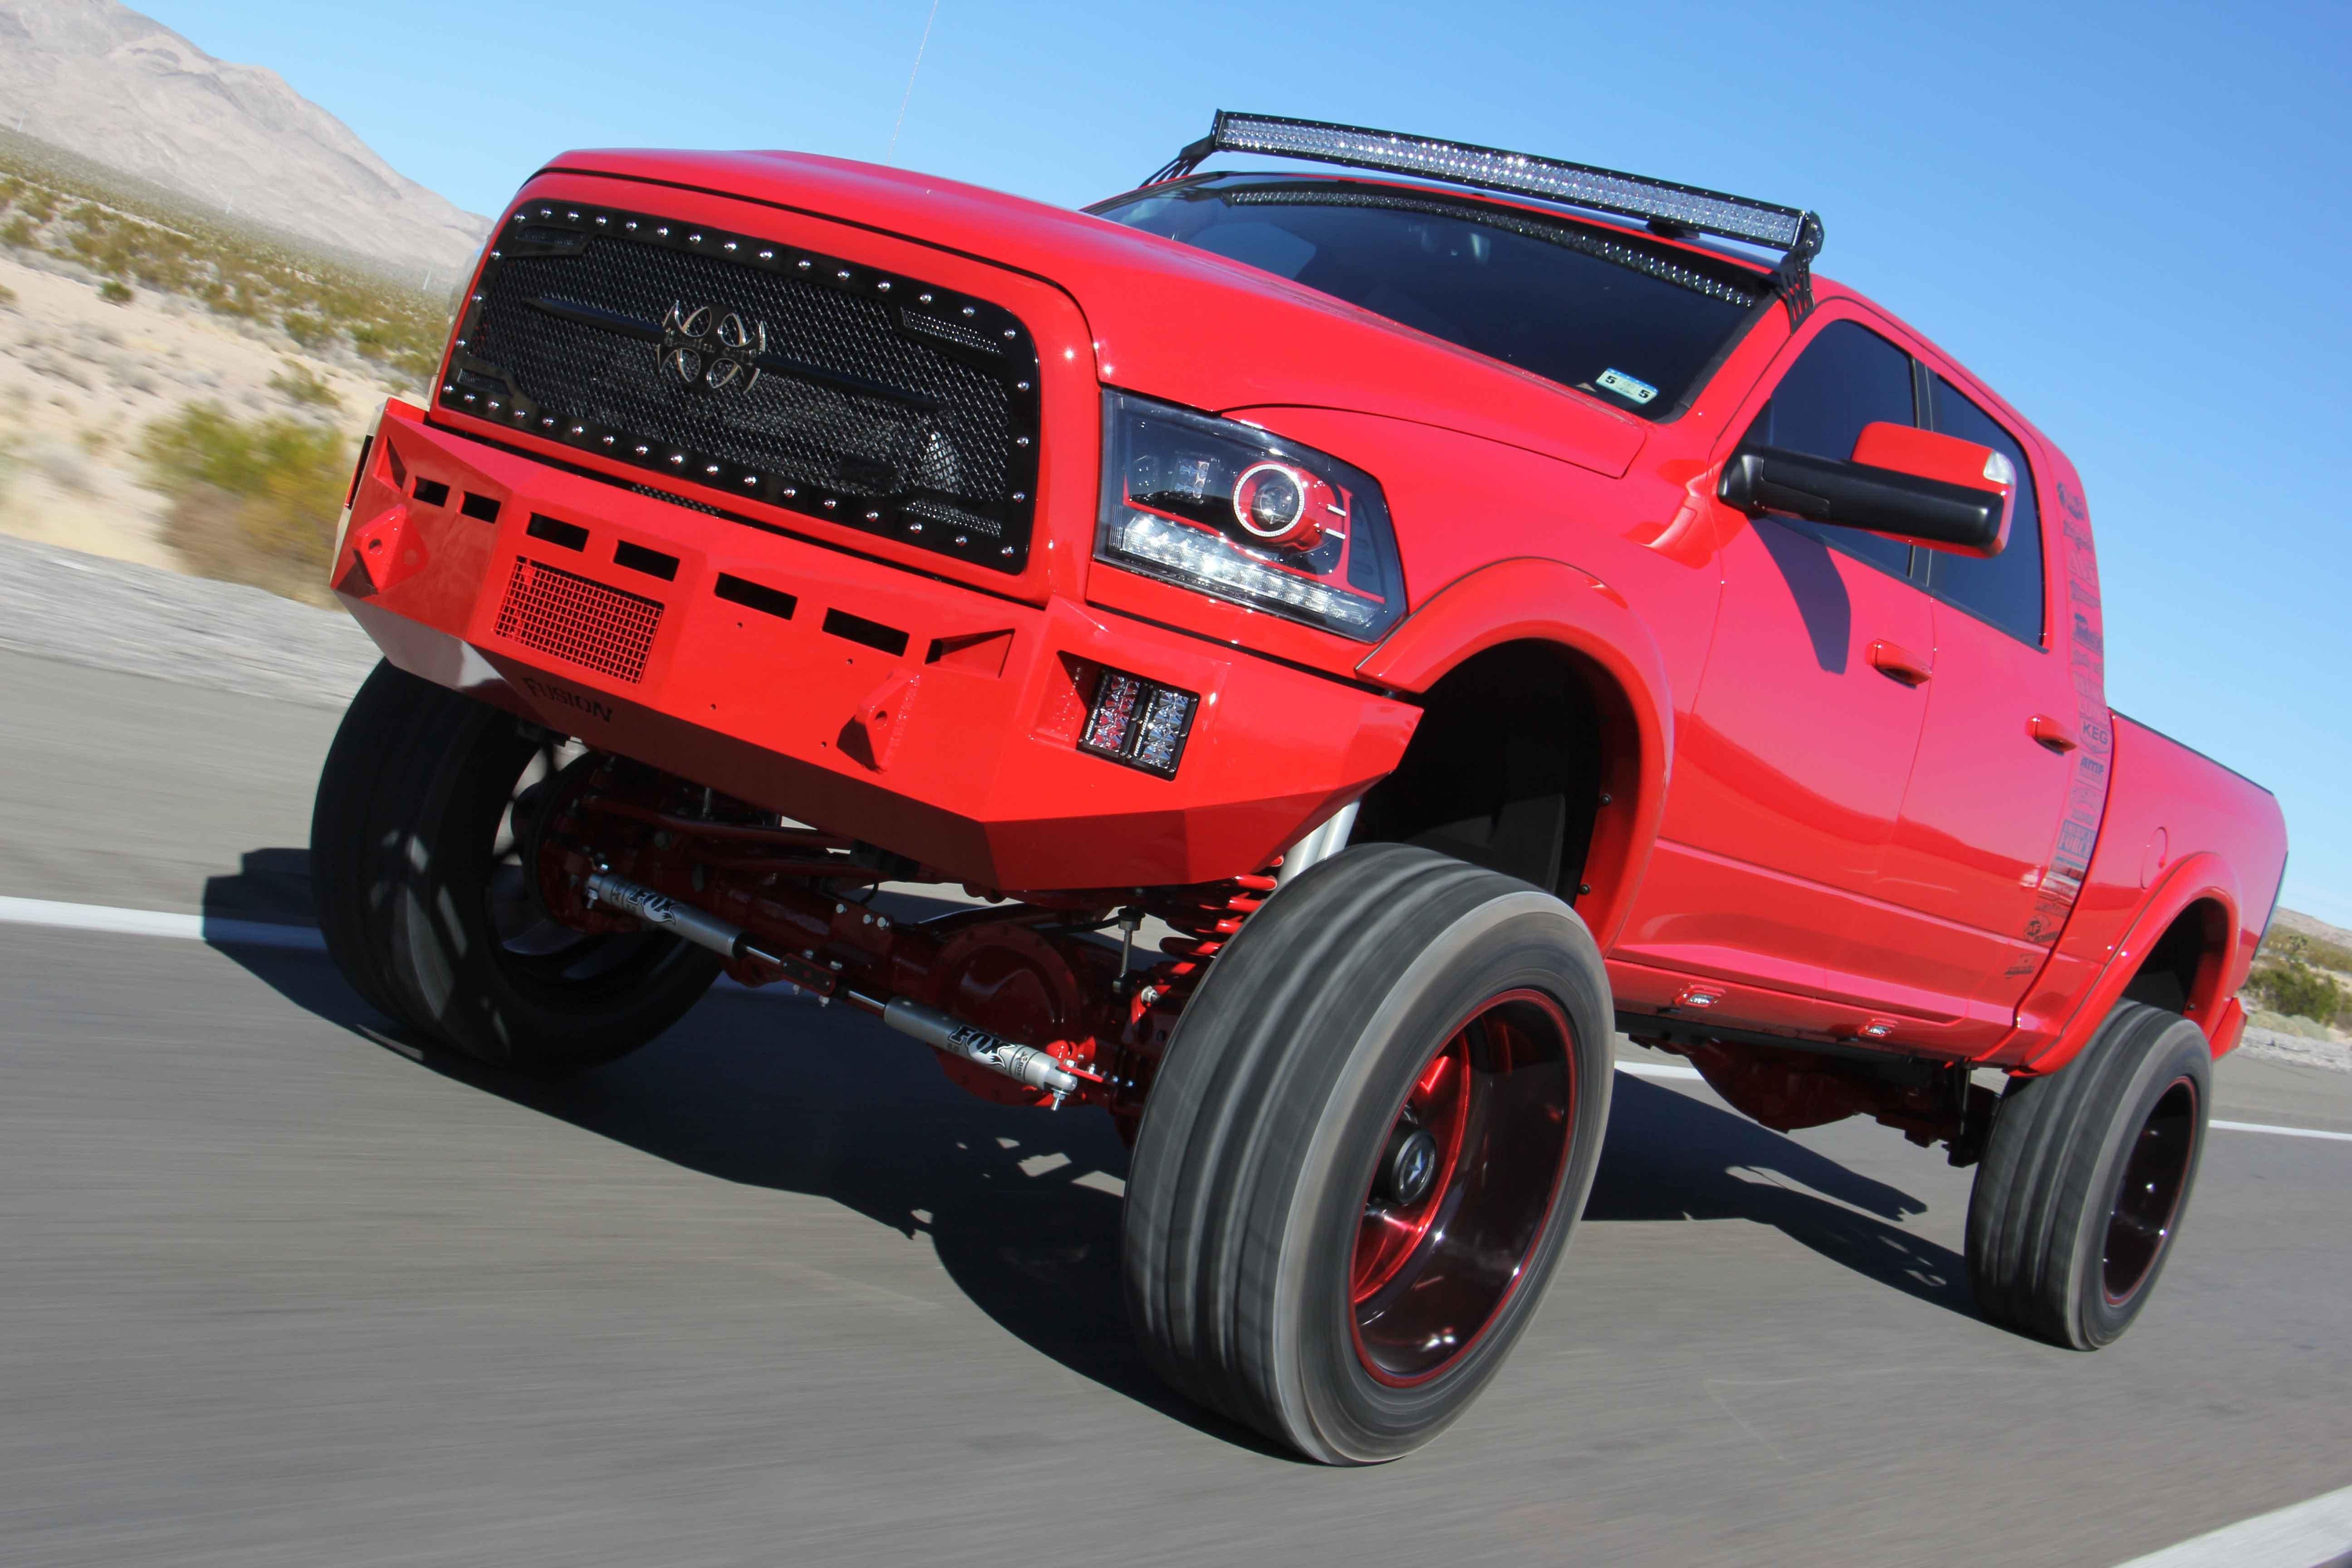 Radical Fire Truck Lifted Dodge Ram Megacab Carid Com Gallery